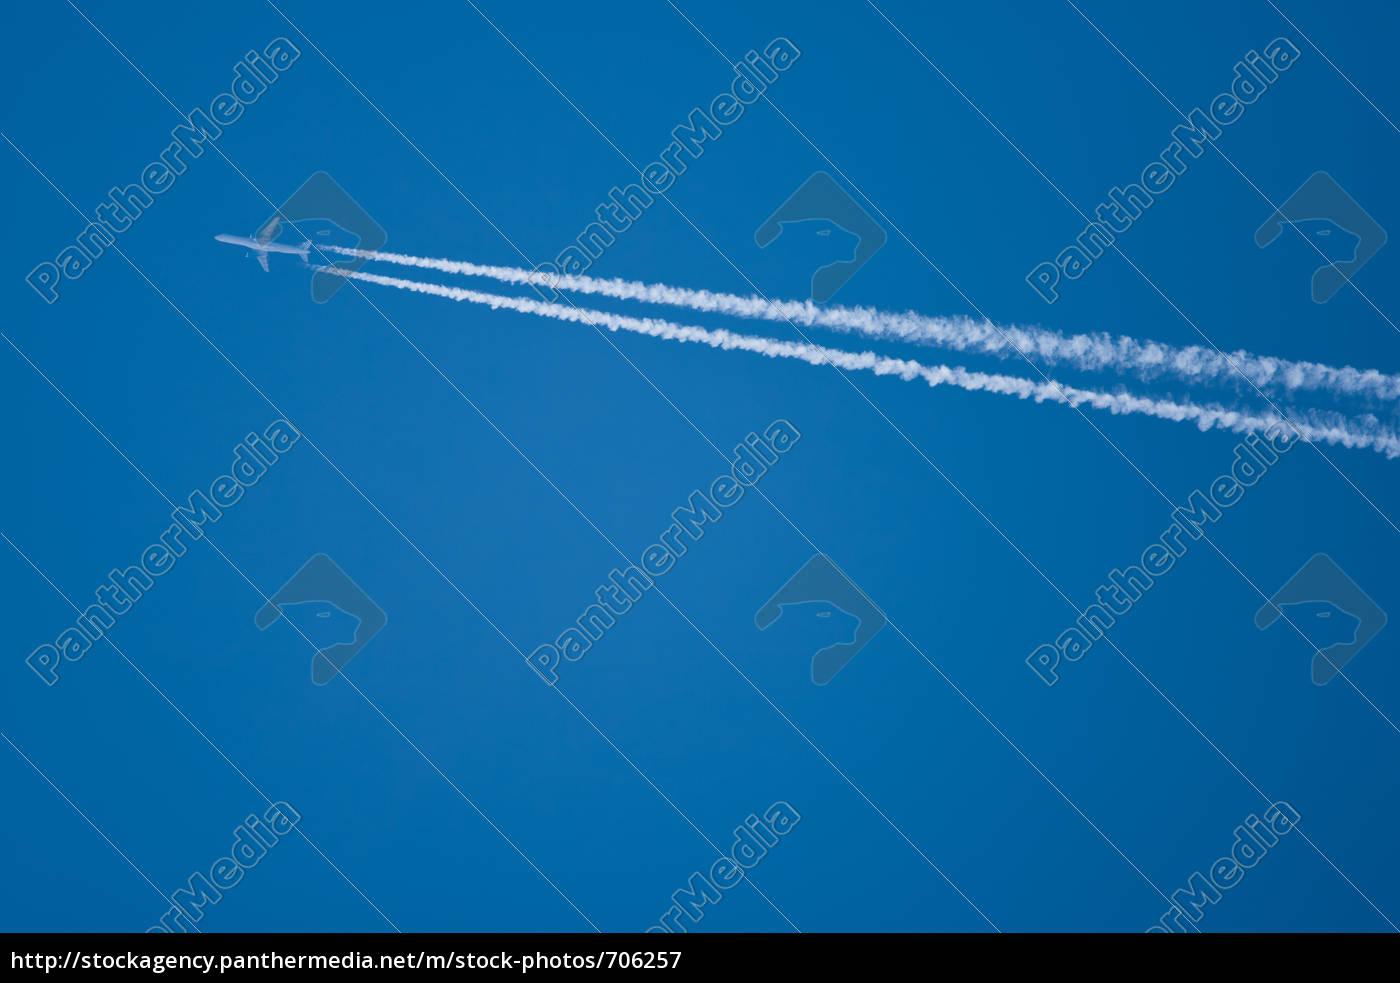 airplane, on, blue, sky - 706257